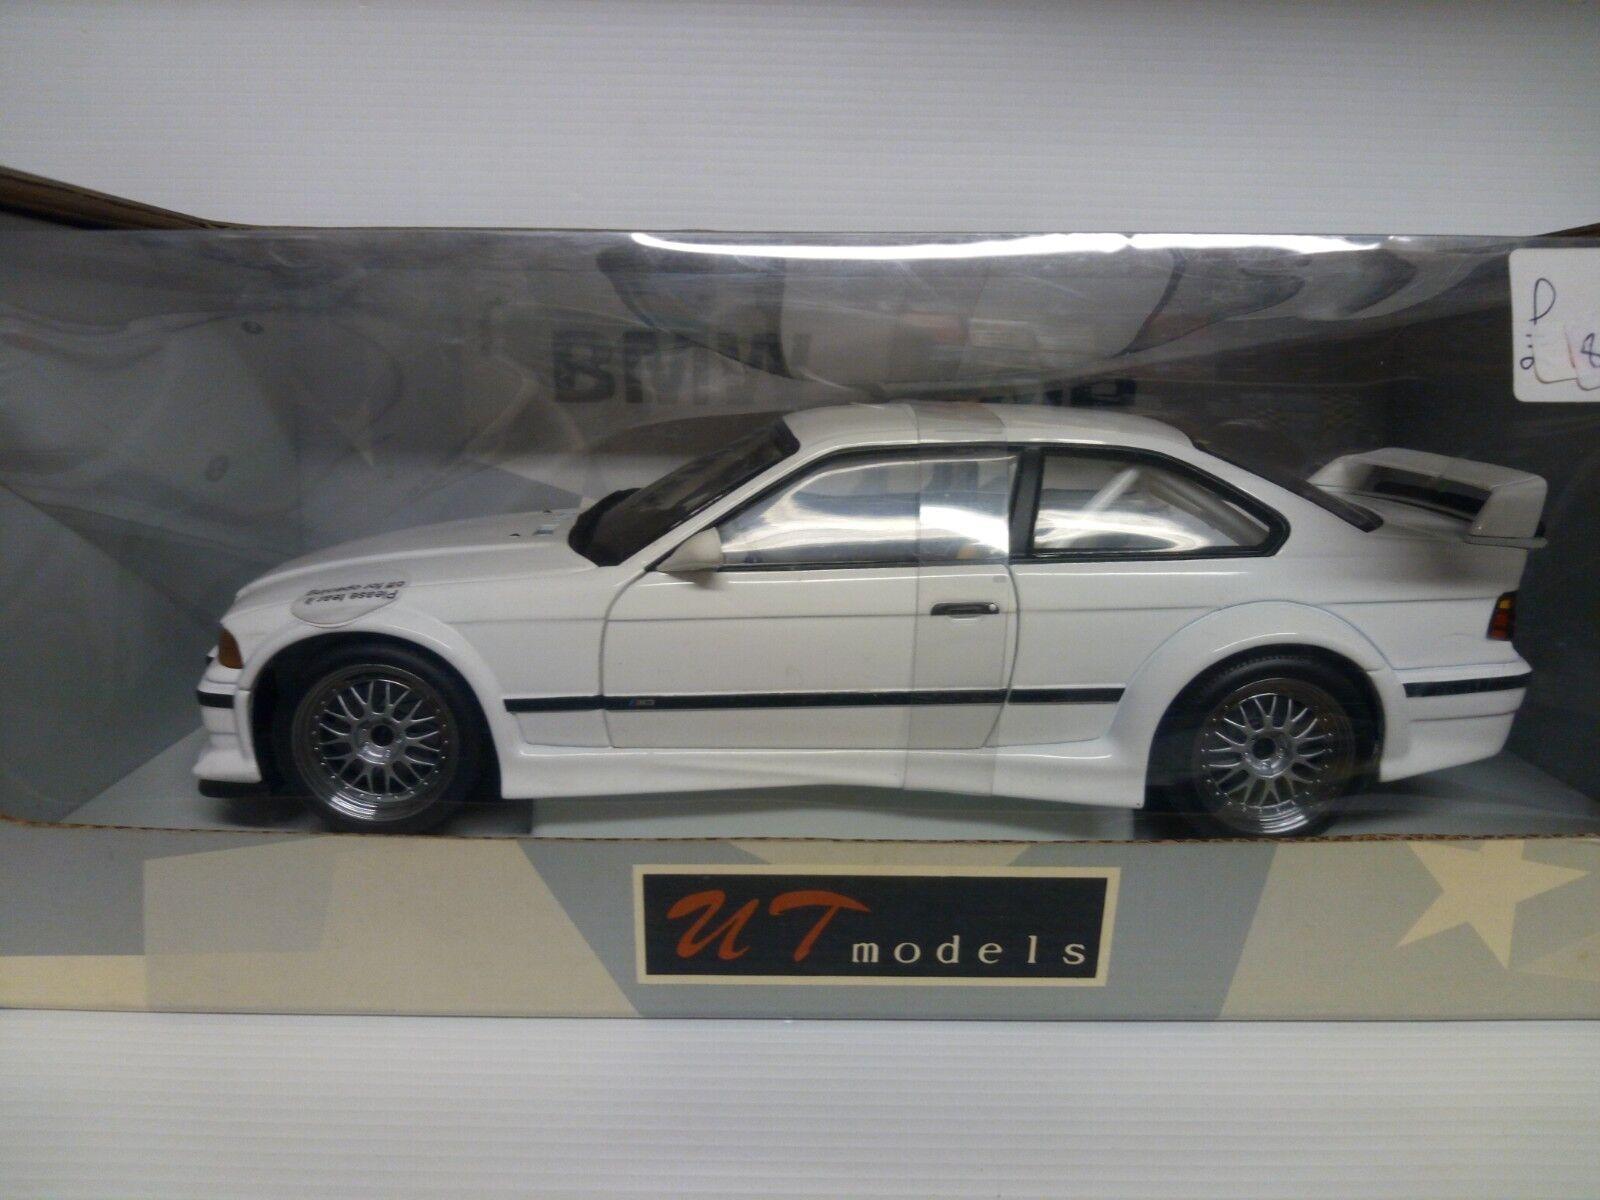 UT MODELS BMW M3 GTR 1 18  blanc blanc RARAx